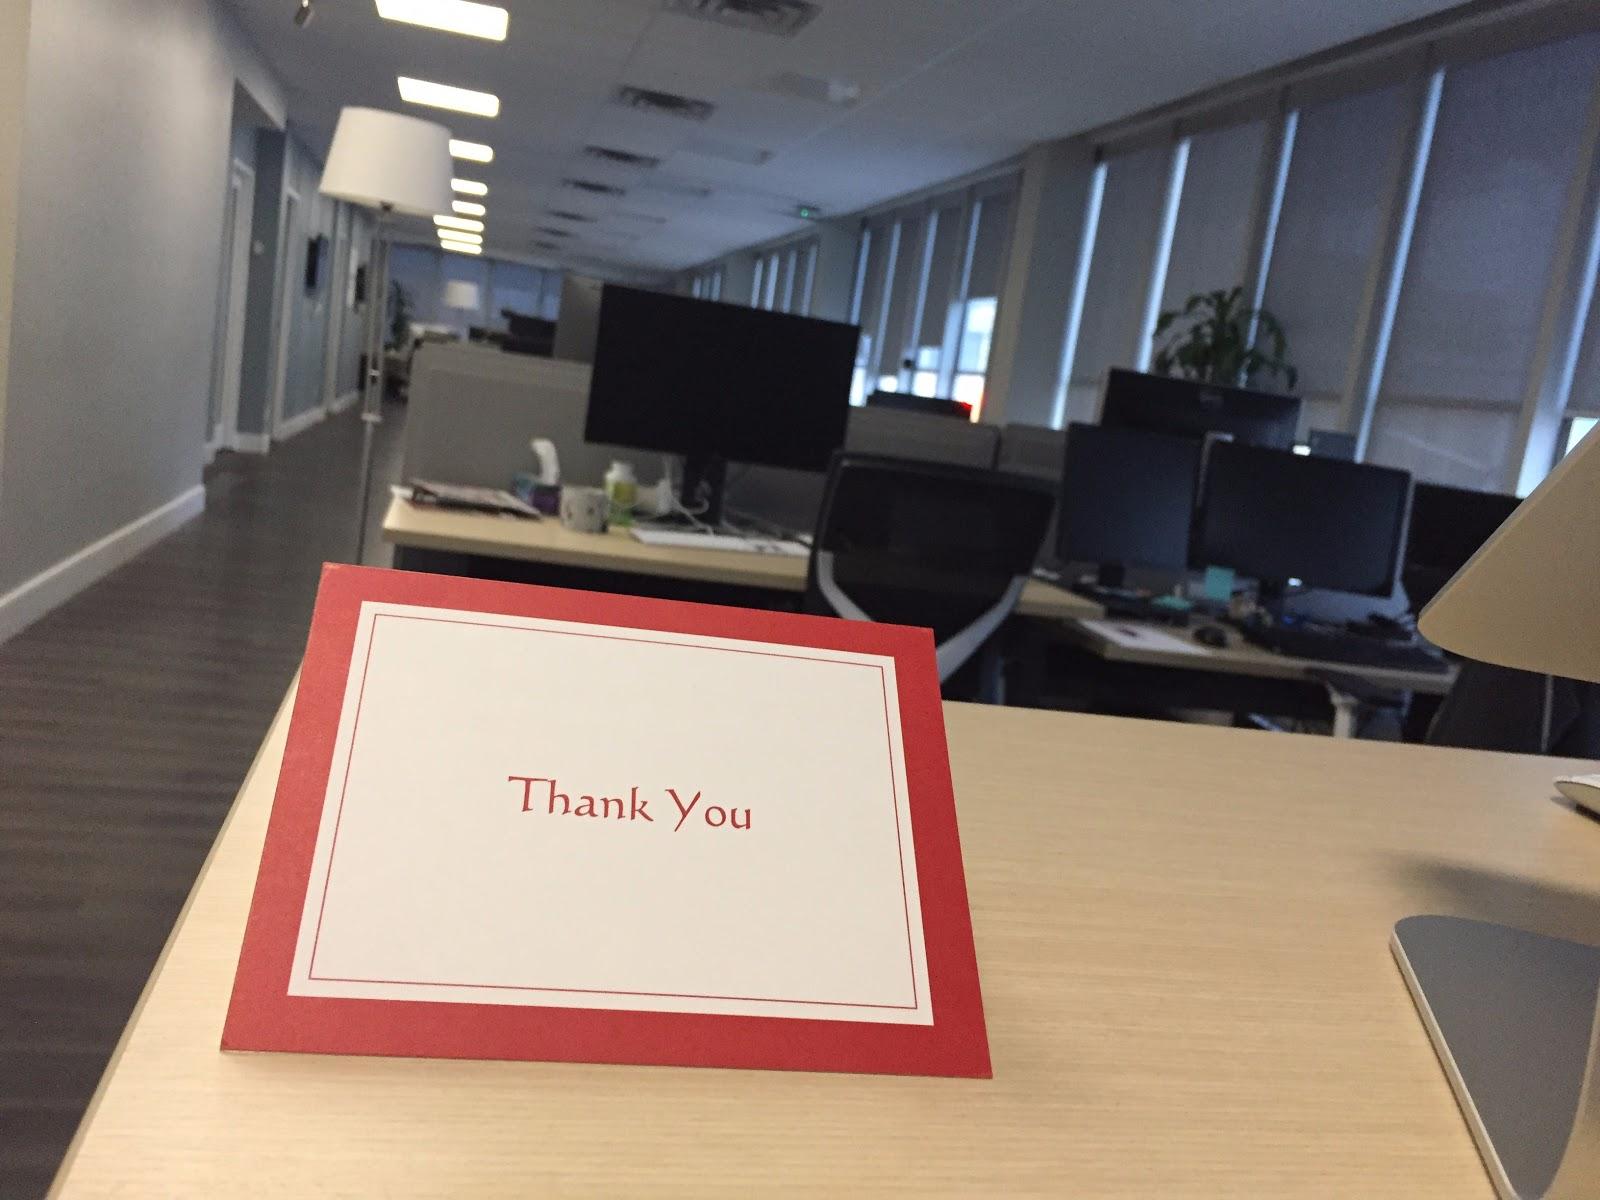 Klipfolio's customized thank-you award card